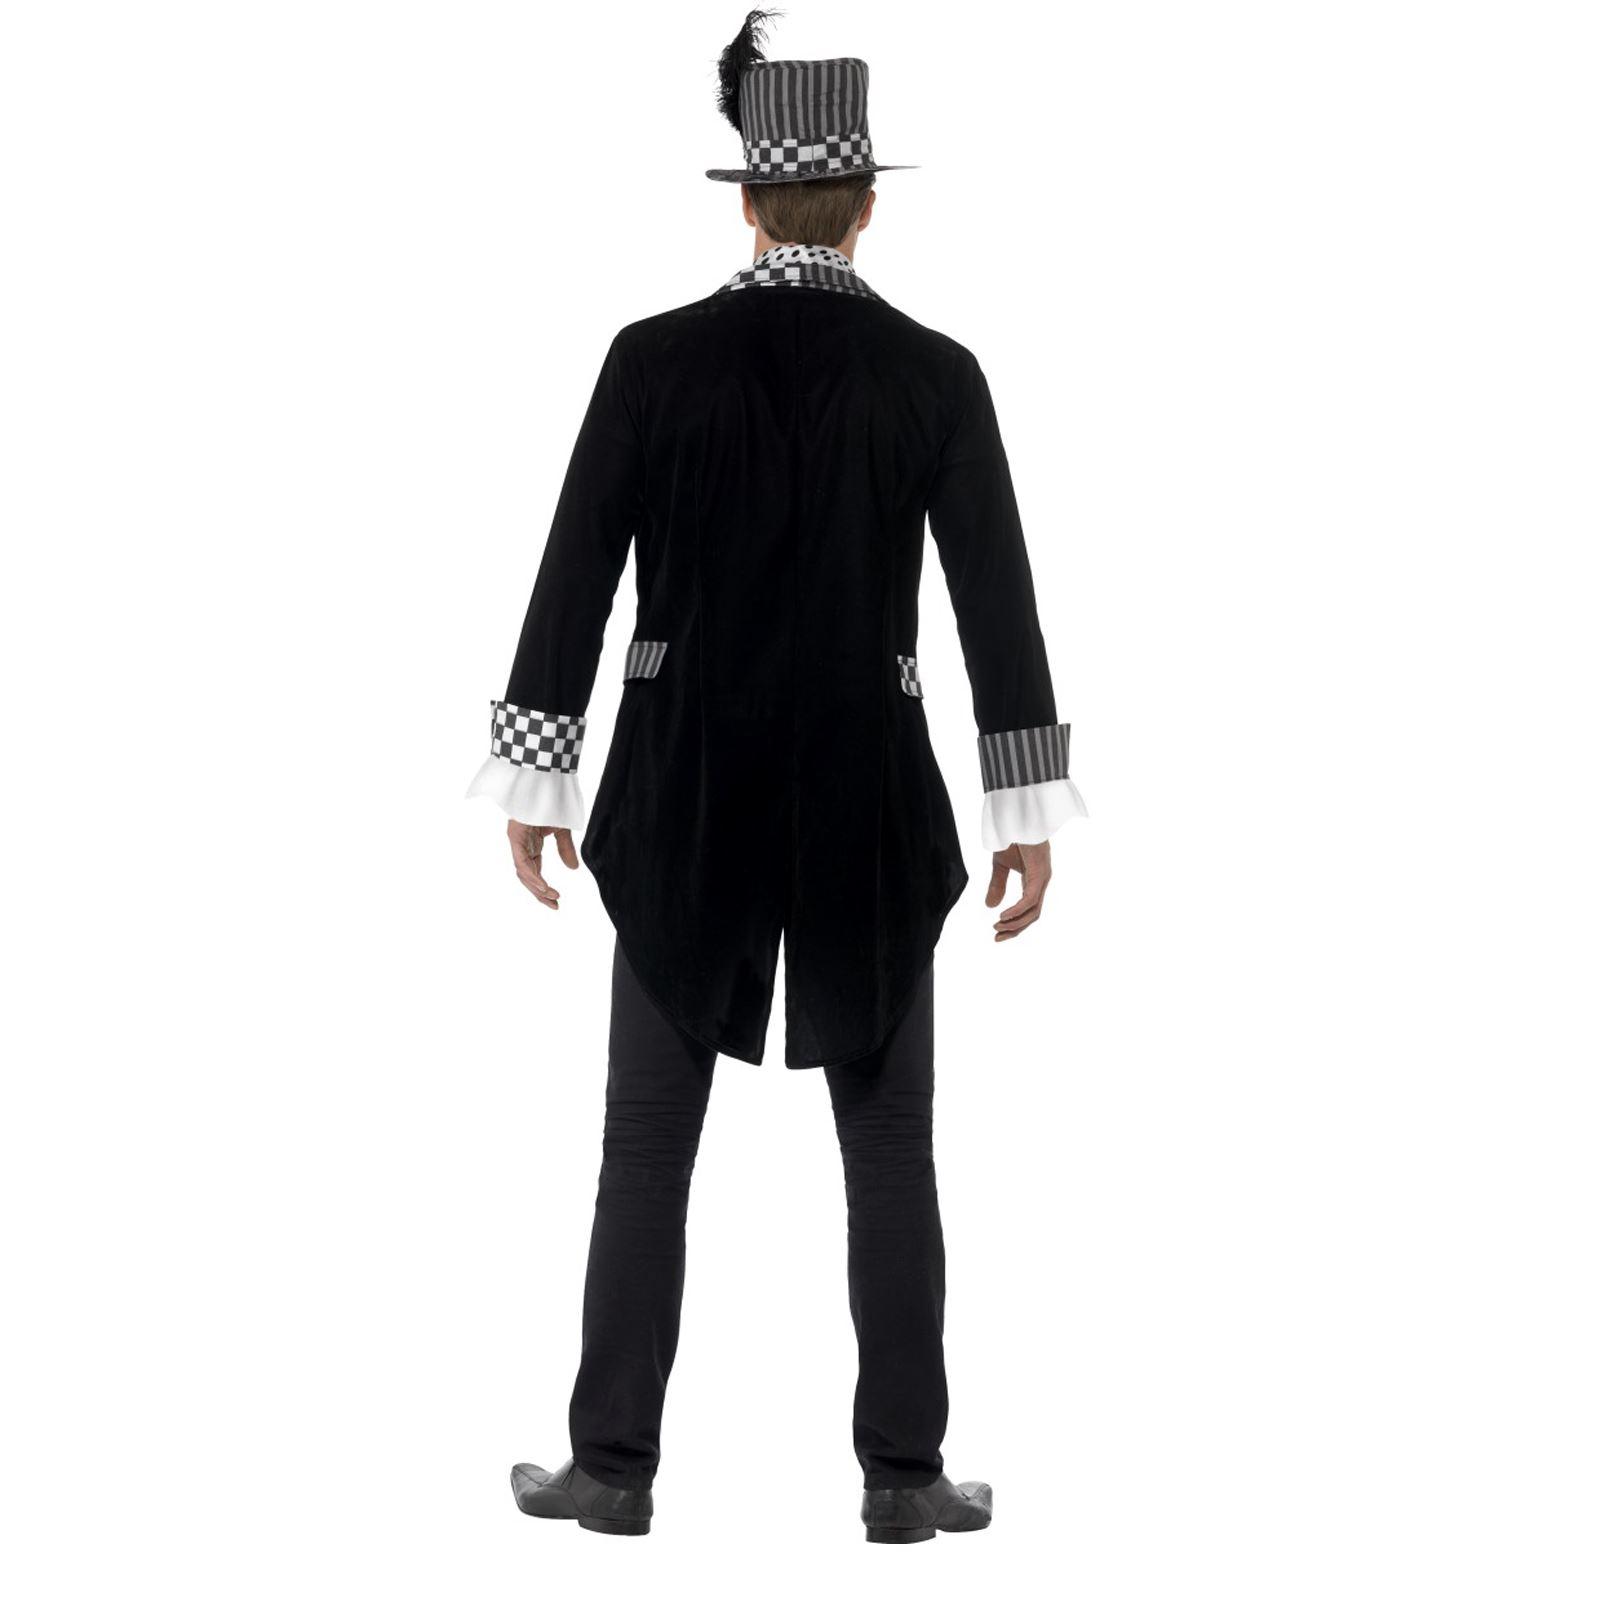 64b361961c Details about Adult Halloween Mens Dark Mad Hatter Tea Party Fancy Dress  Costume Jester Clown